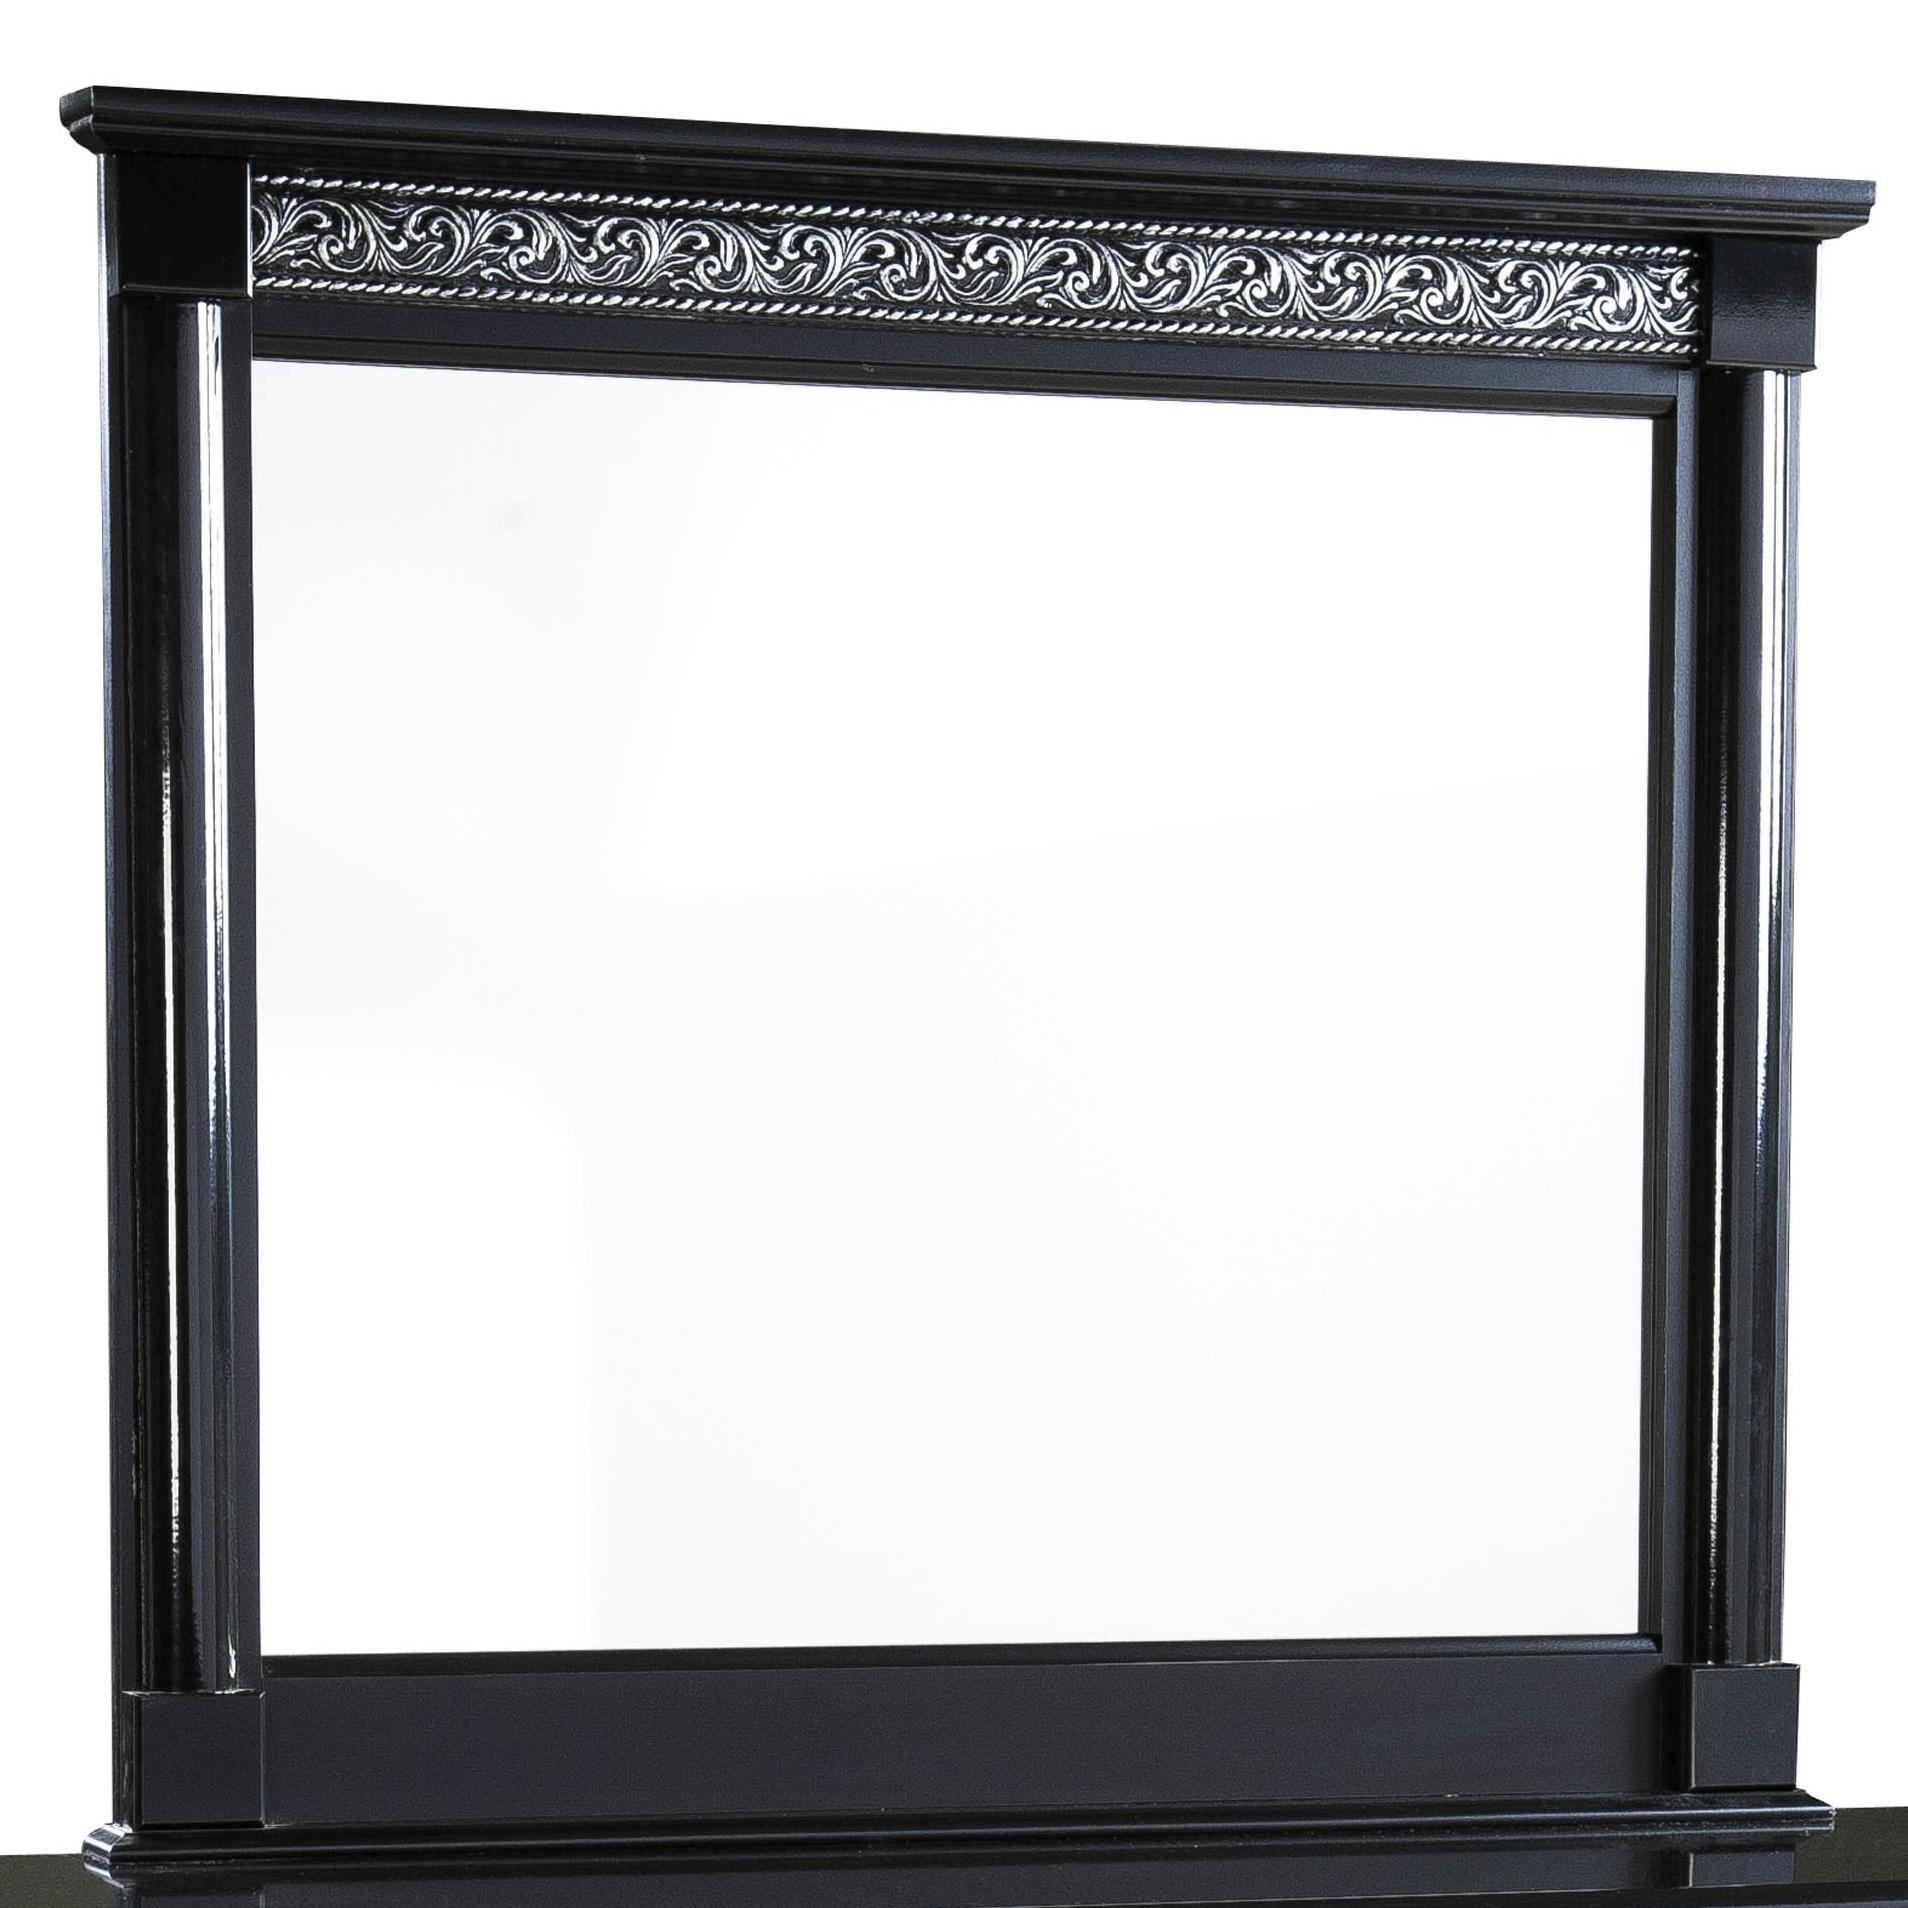 Standard Furniture Venetian Mirror - Item Number: 69268